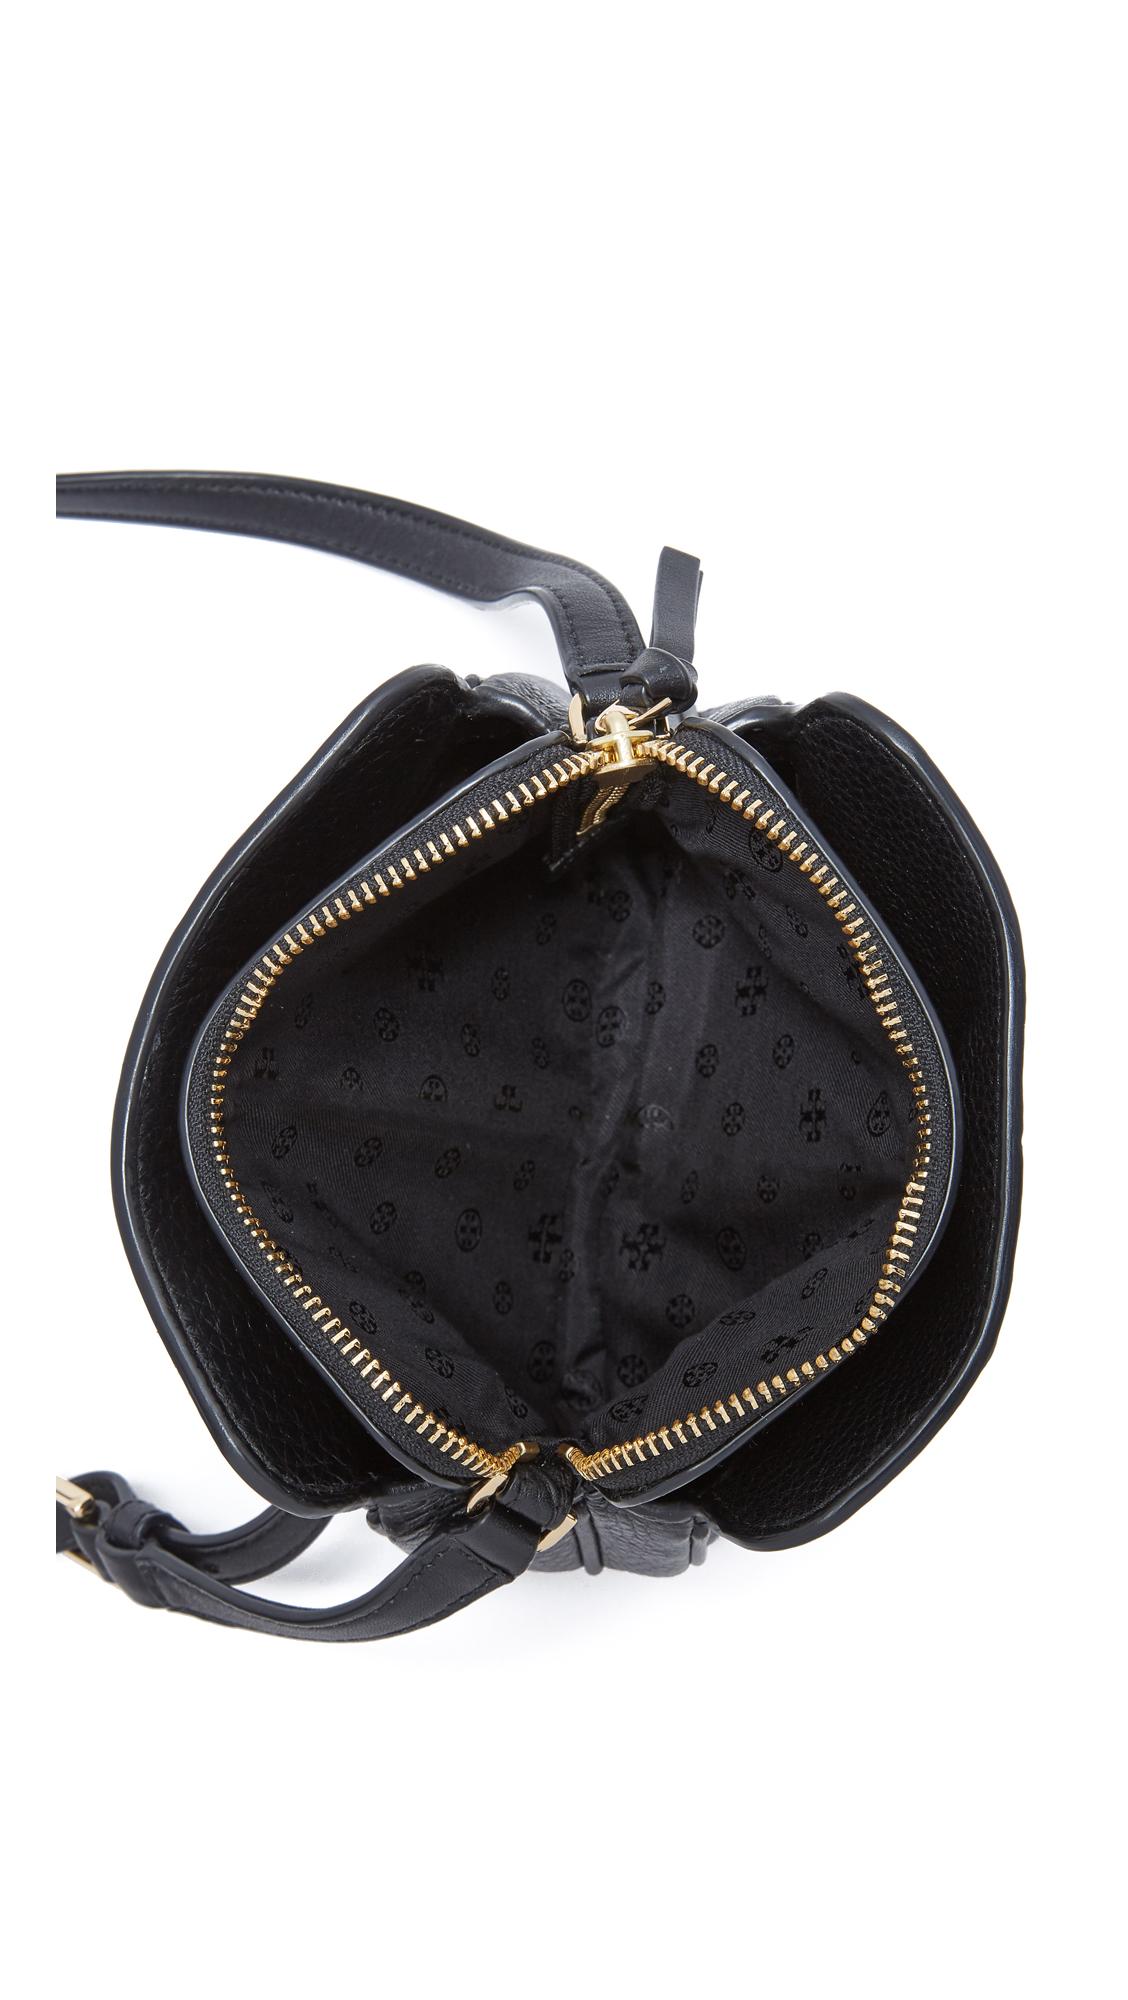 7693dfeef50 Tory Burch Ivy Micro Zip Cross Body Bag